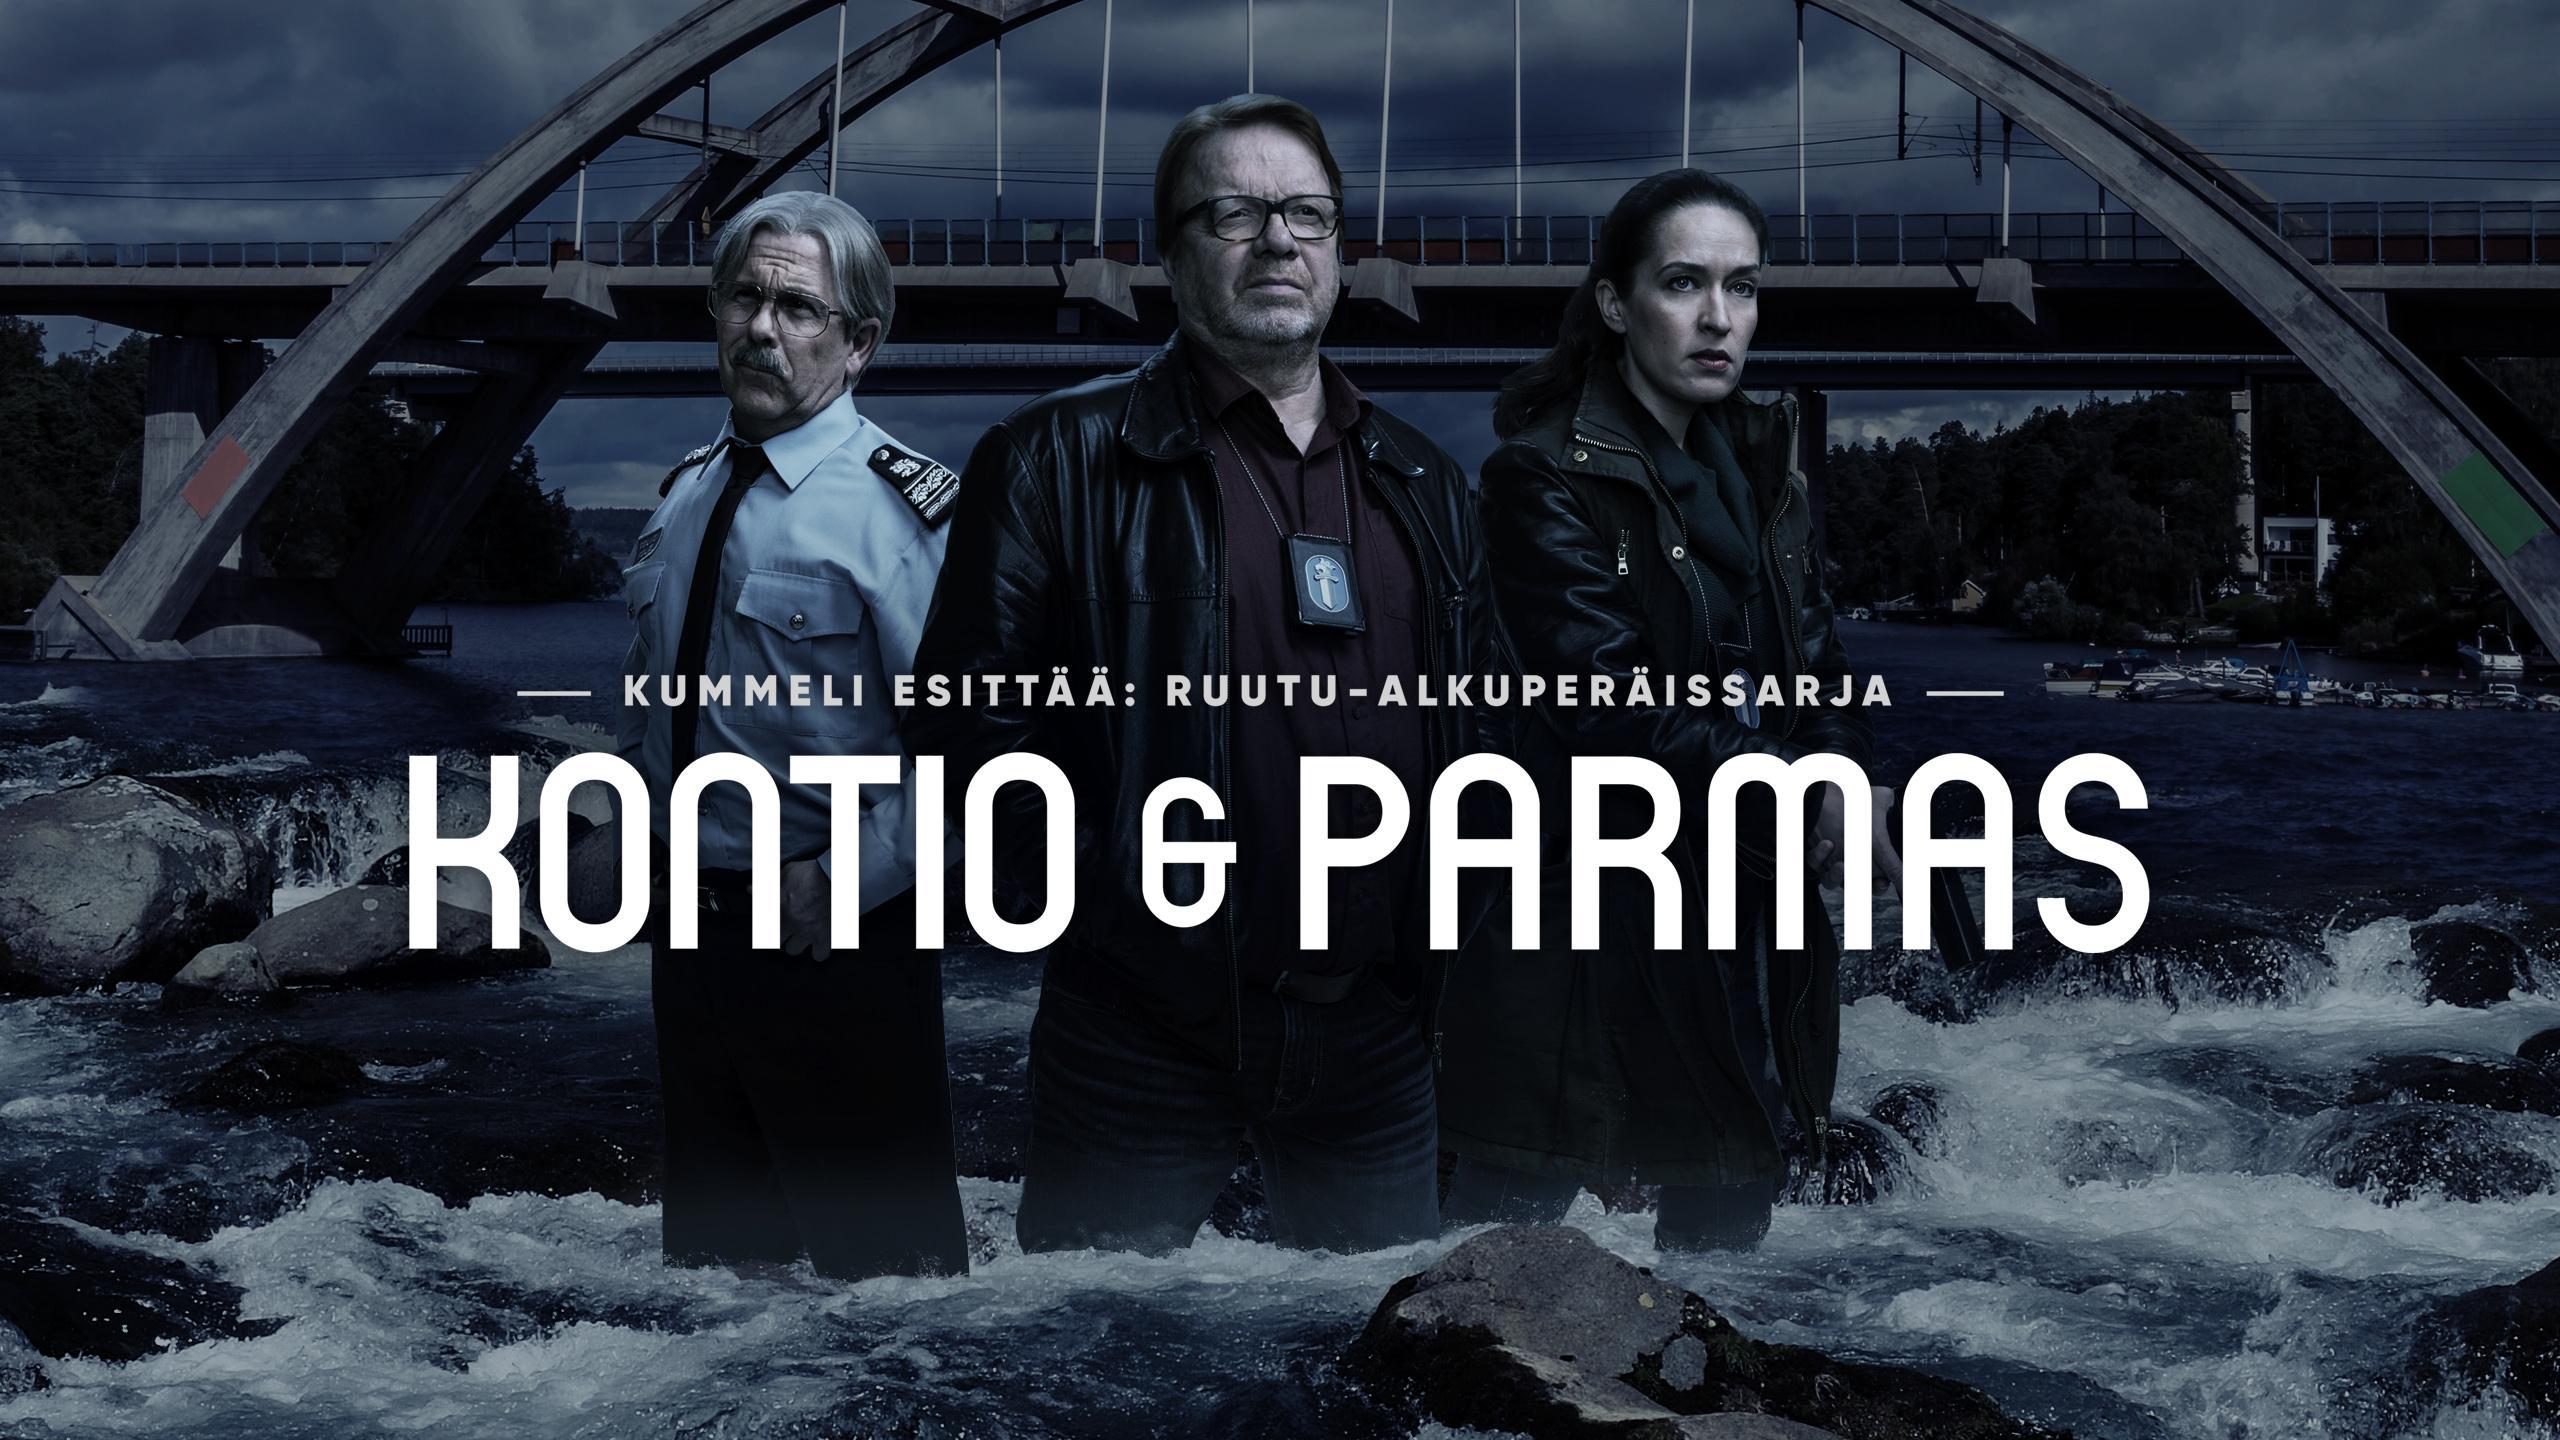 Kummeli Kontio Ja Parmas